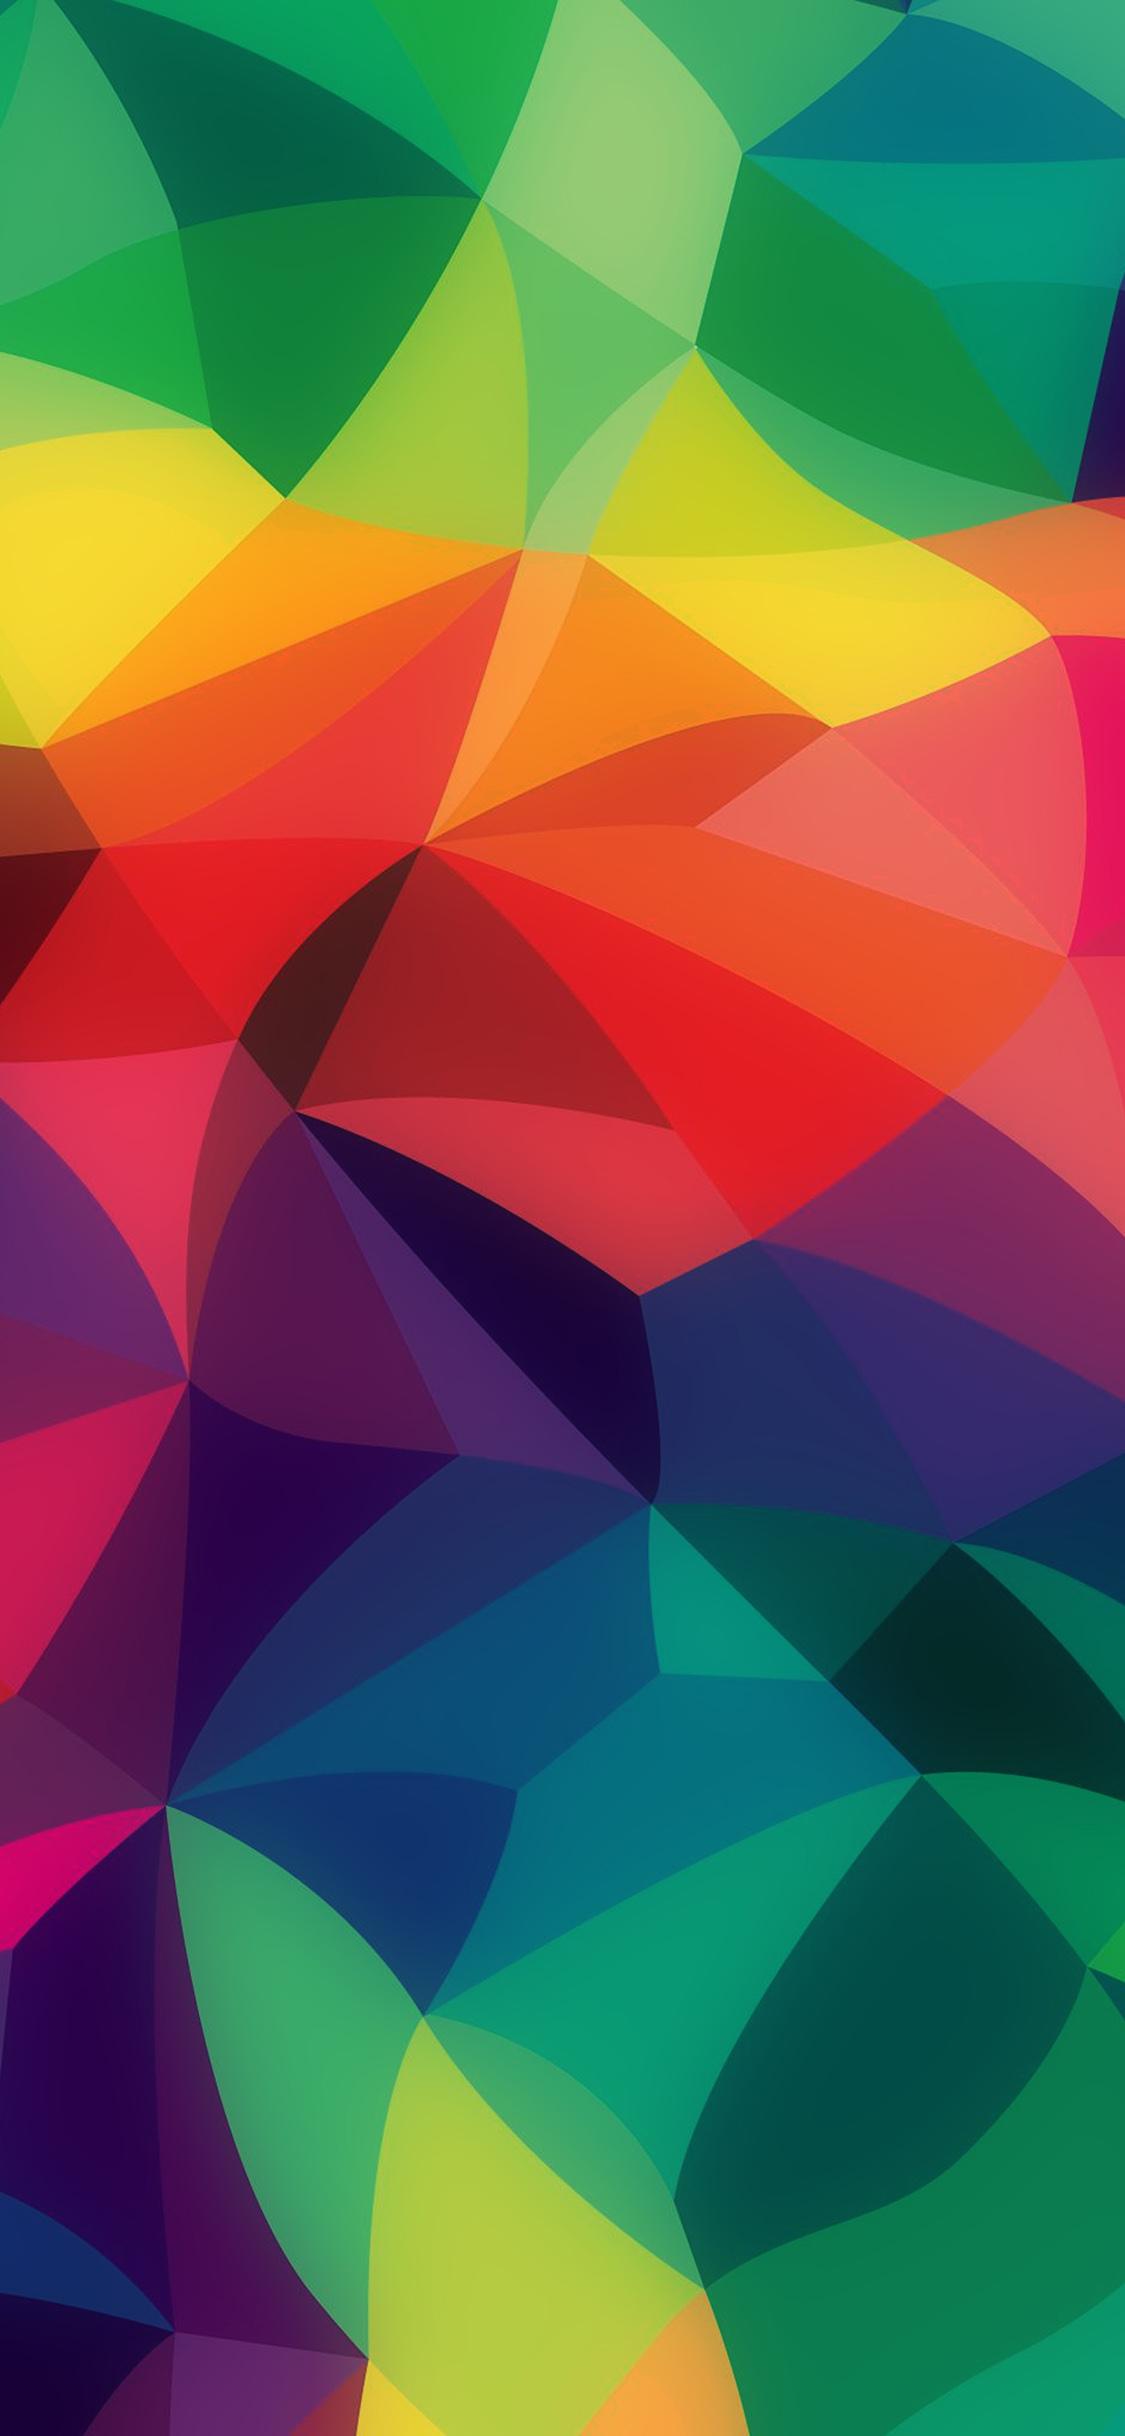 iphonexpapers com iphone x wallpaper vk42 rainbow abstract